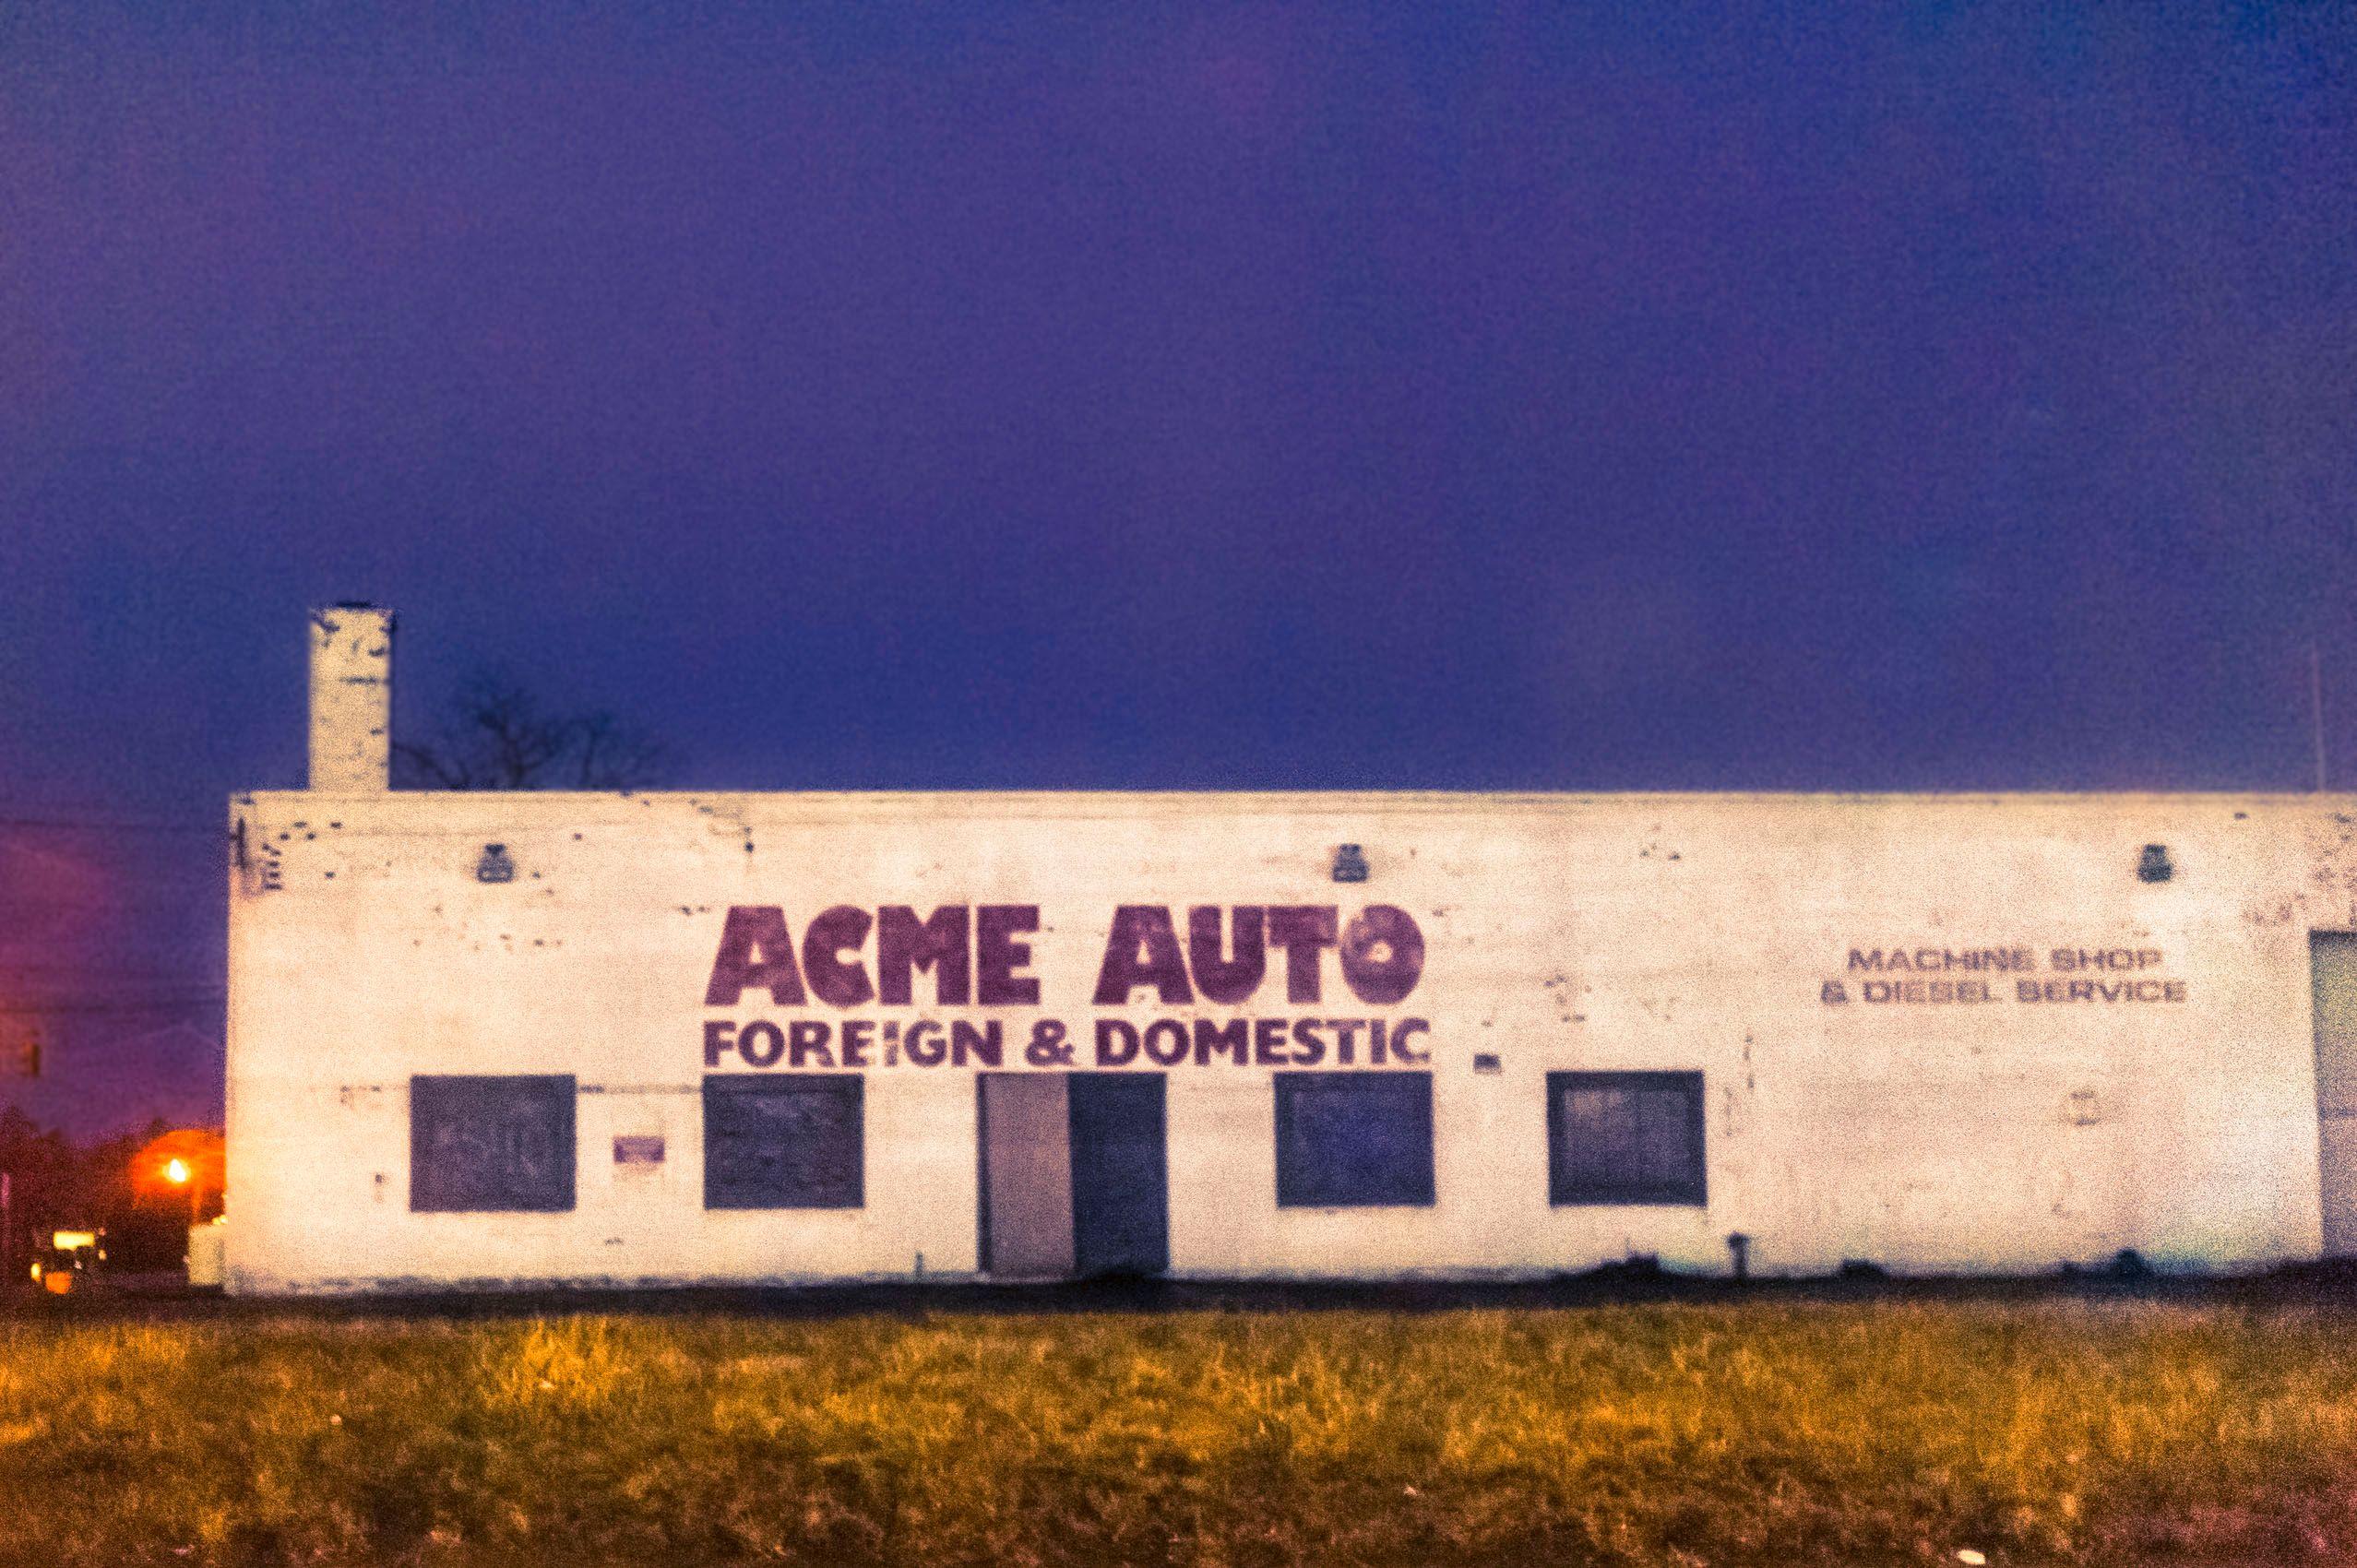 AcmeAuto.jpg